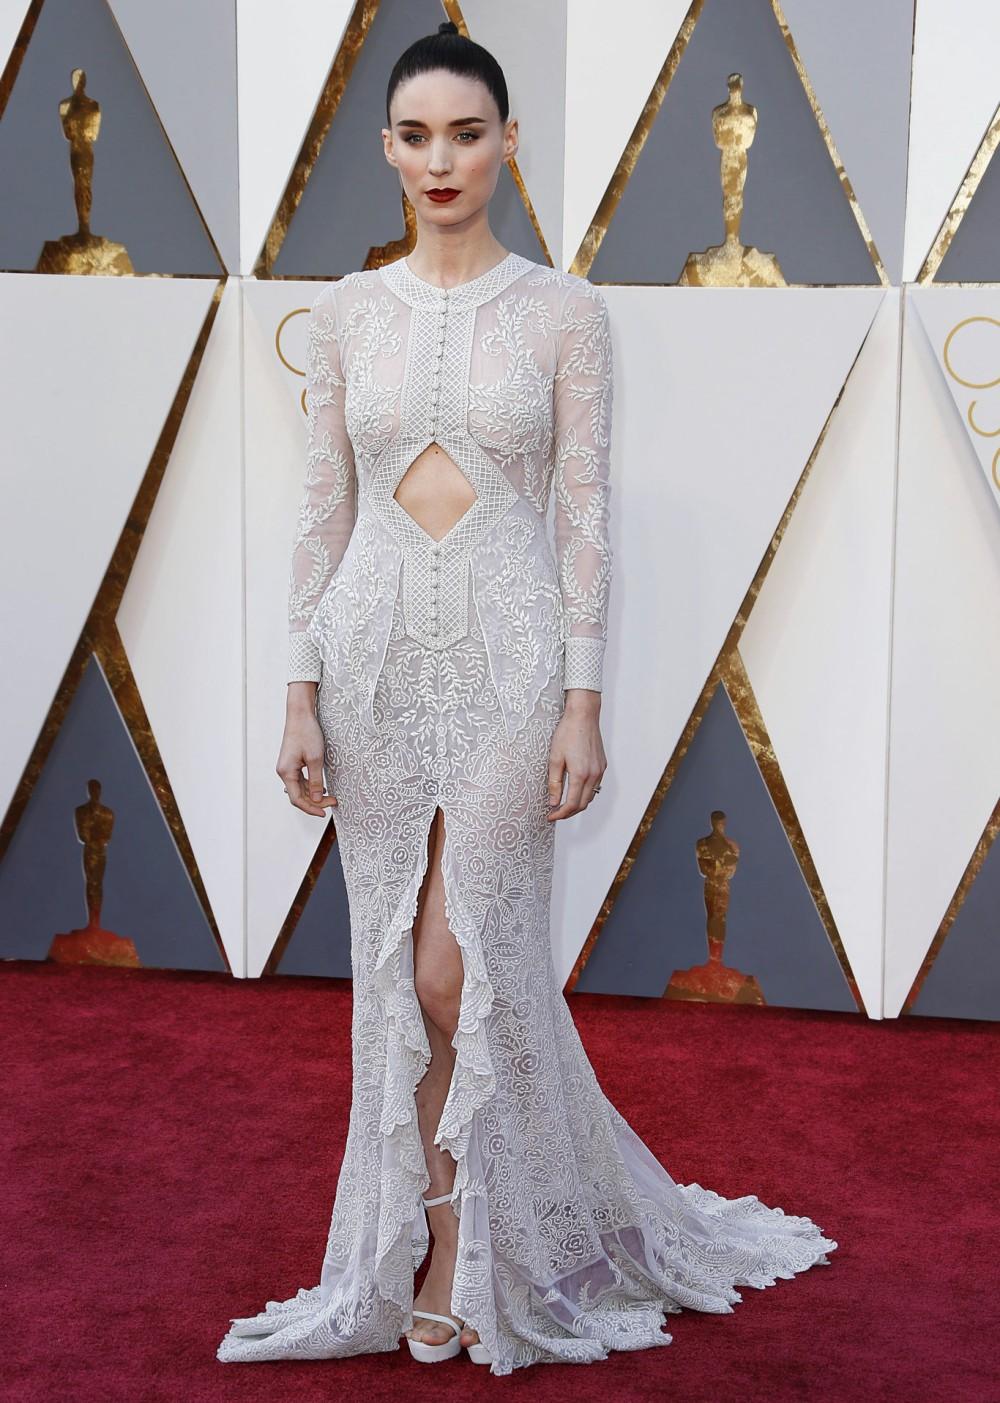 Oscars 2016 Best-Dressed Celebrities